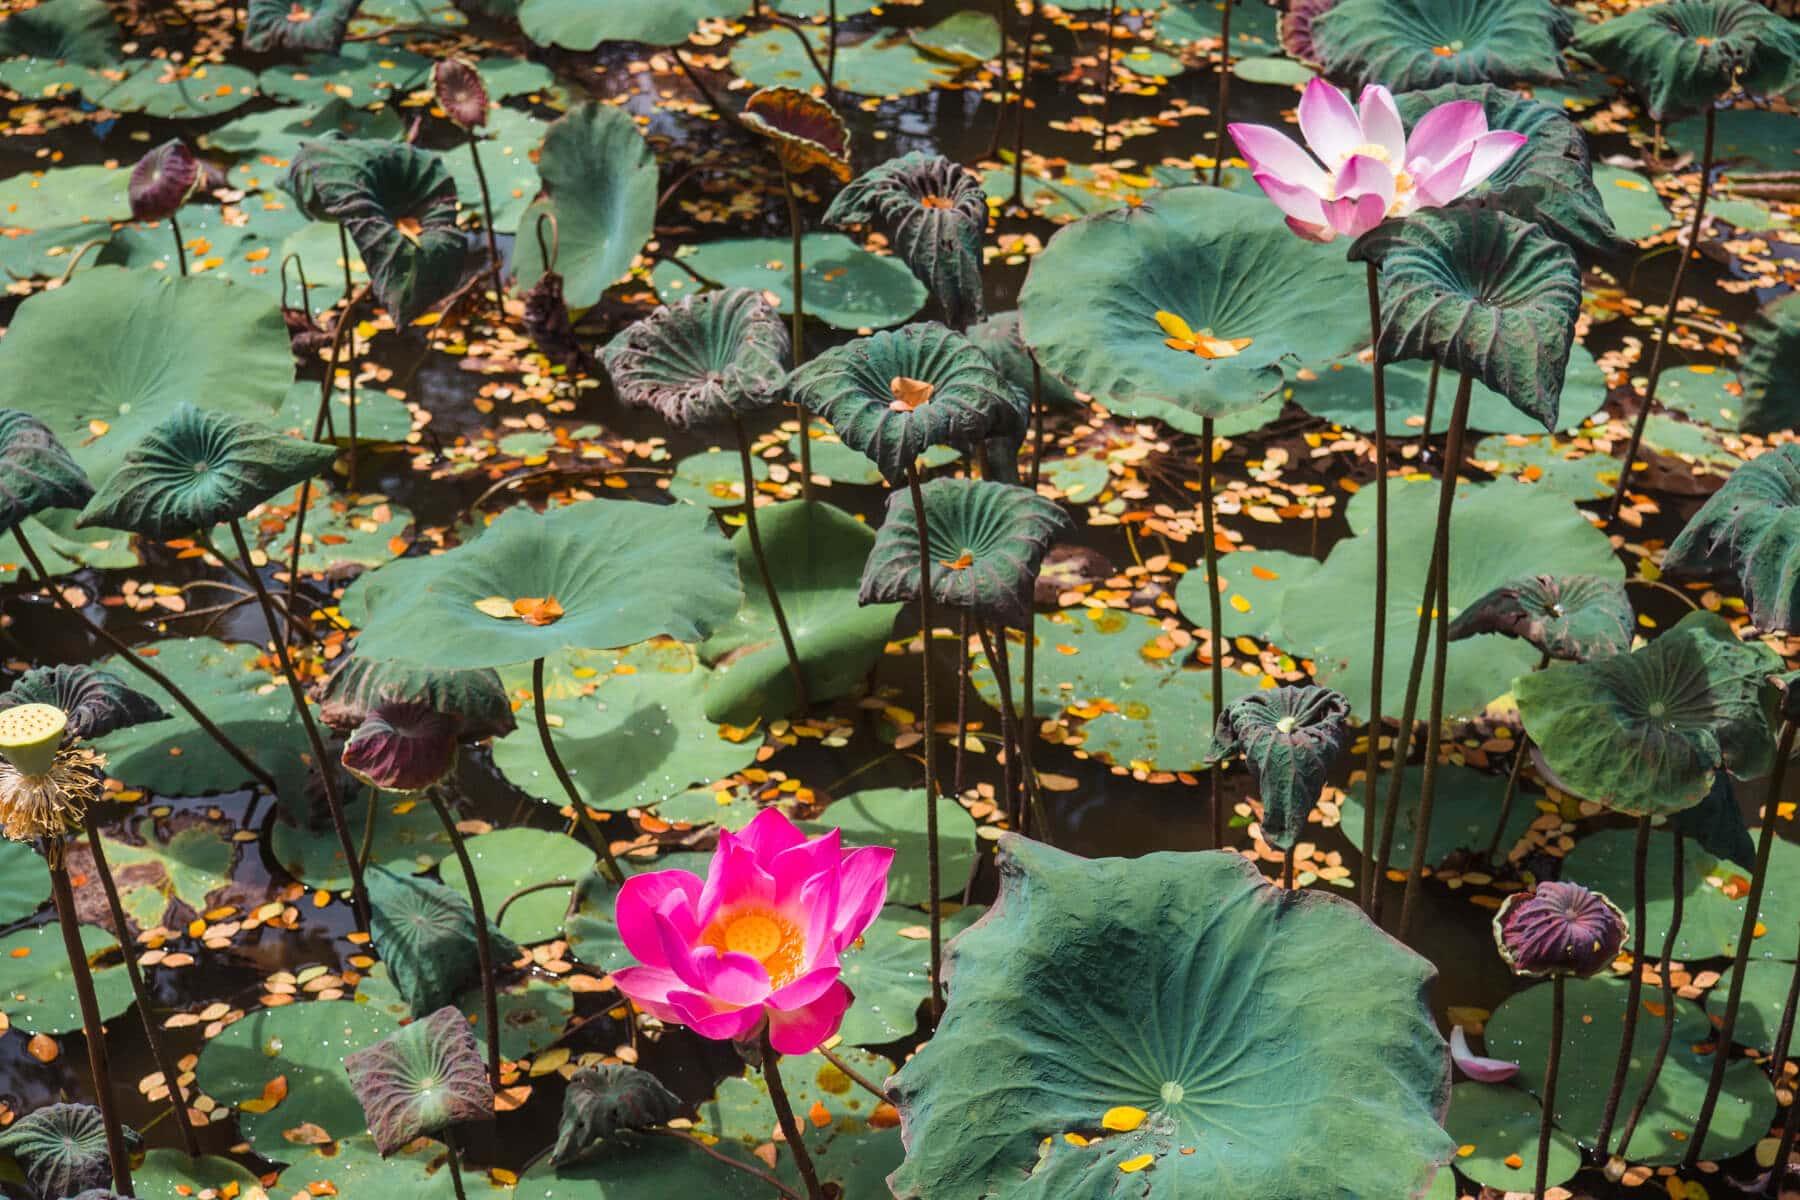 Island Life #4 - Beautiful Lotus flowers at Ubud Palace